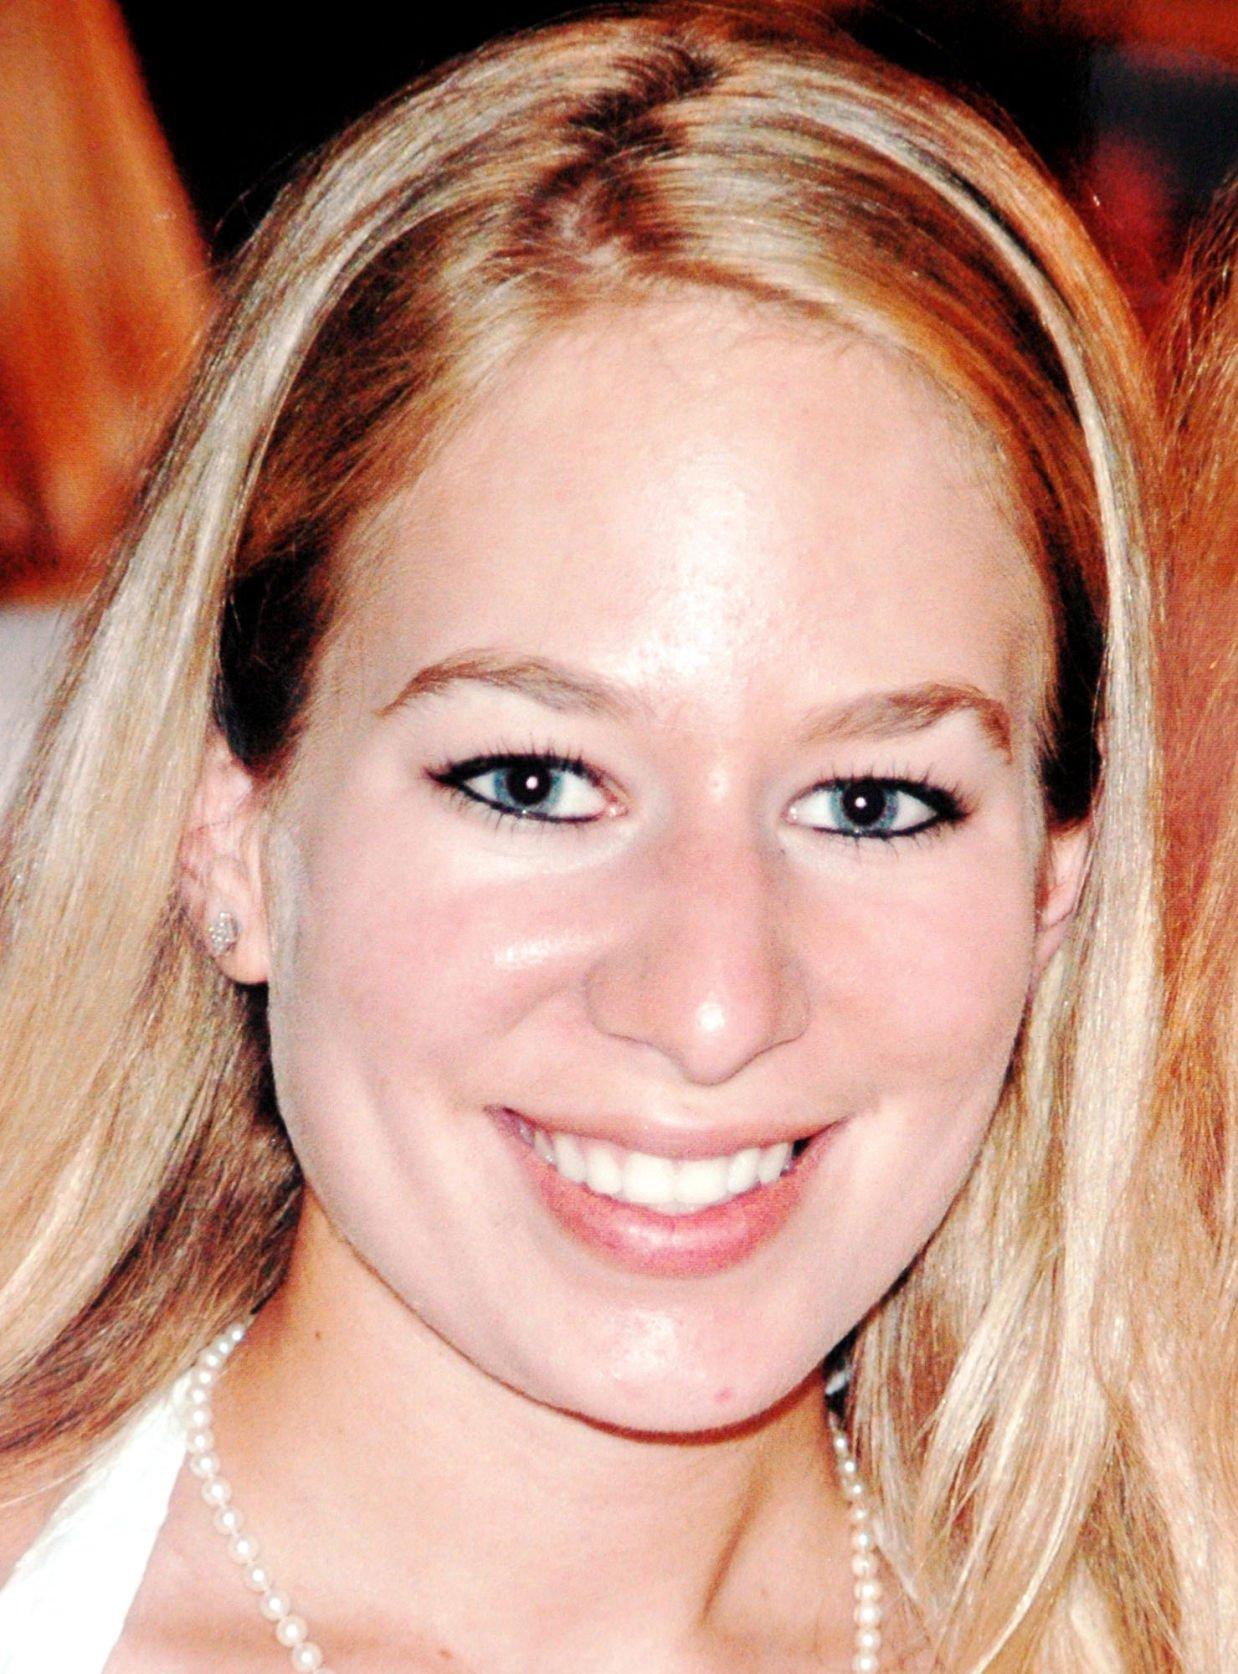 Updates on missing teen natalee holoway